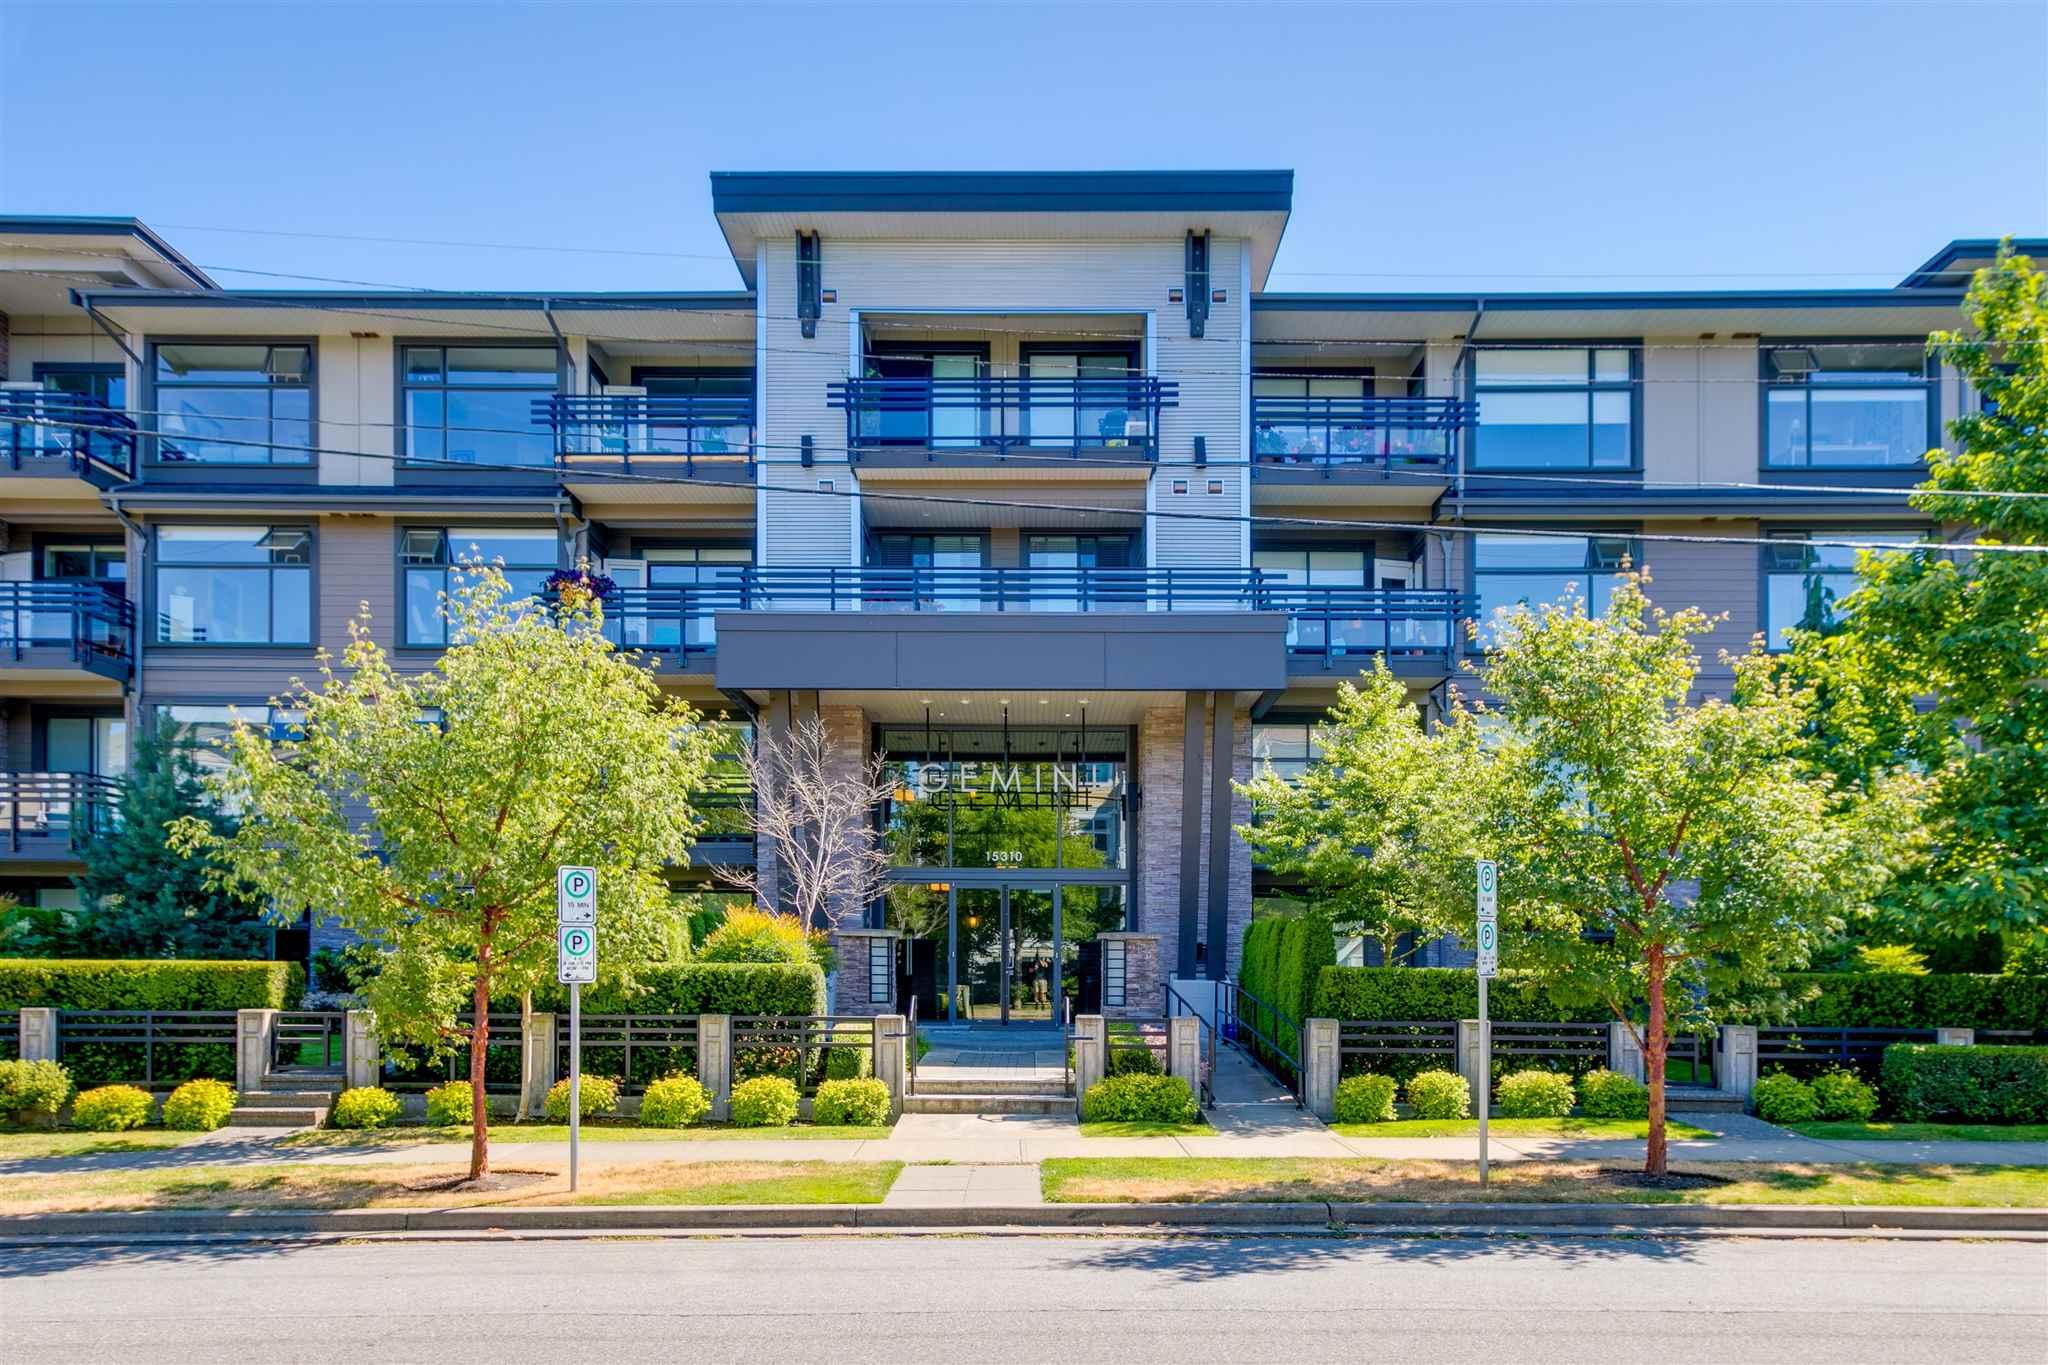 206 15310 17A AVENUE - King George Corridor Apartment/Condo for sale, 2 Bedrooms (R2605186)